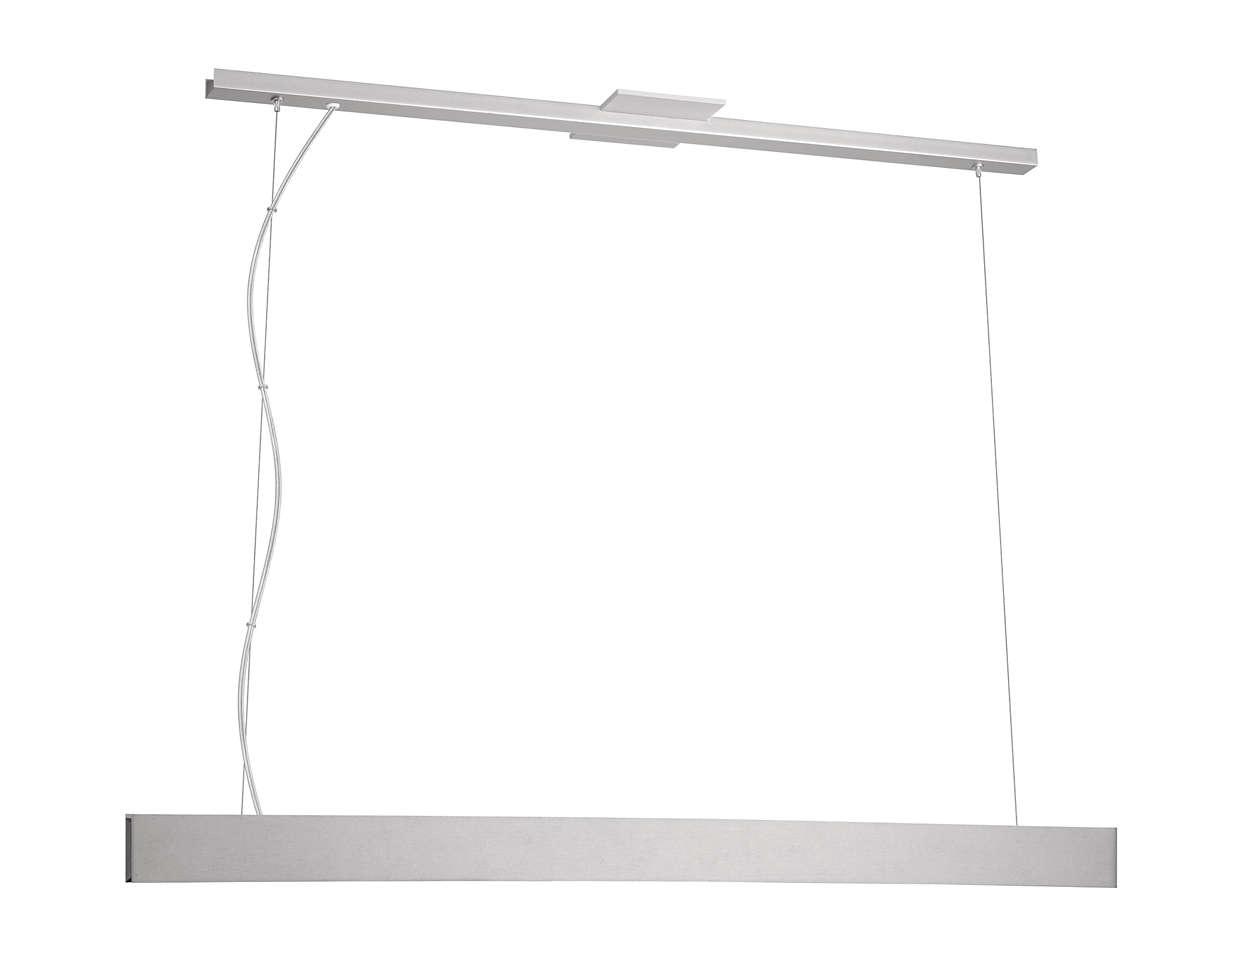 Ledino Metra pendant light